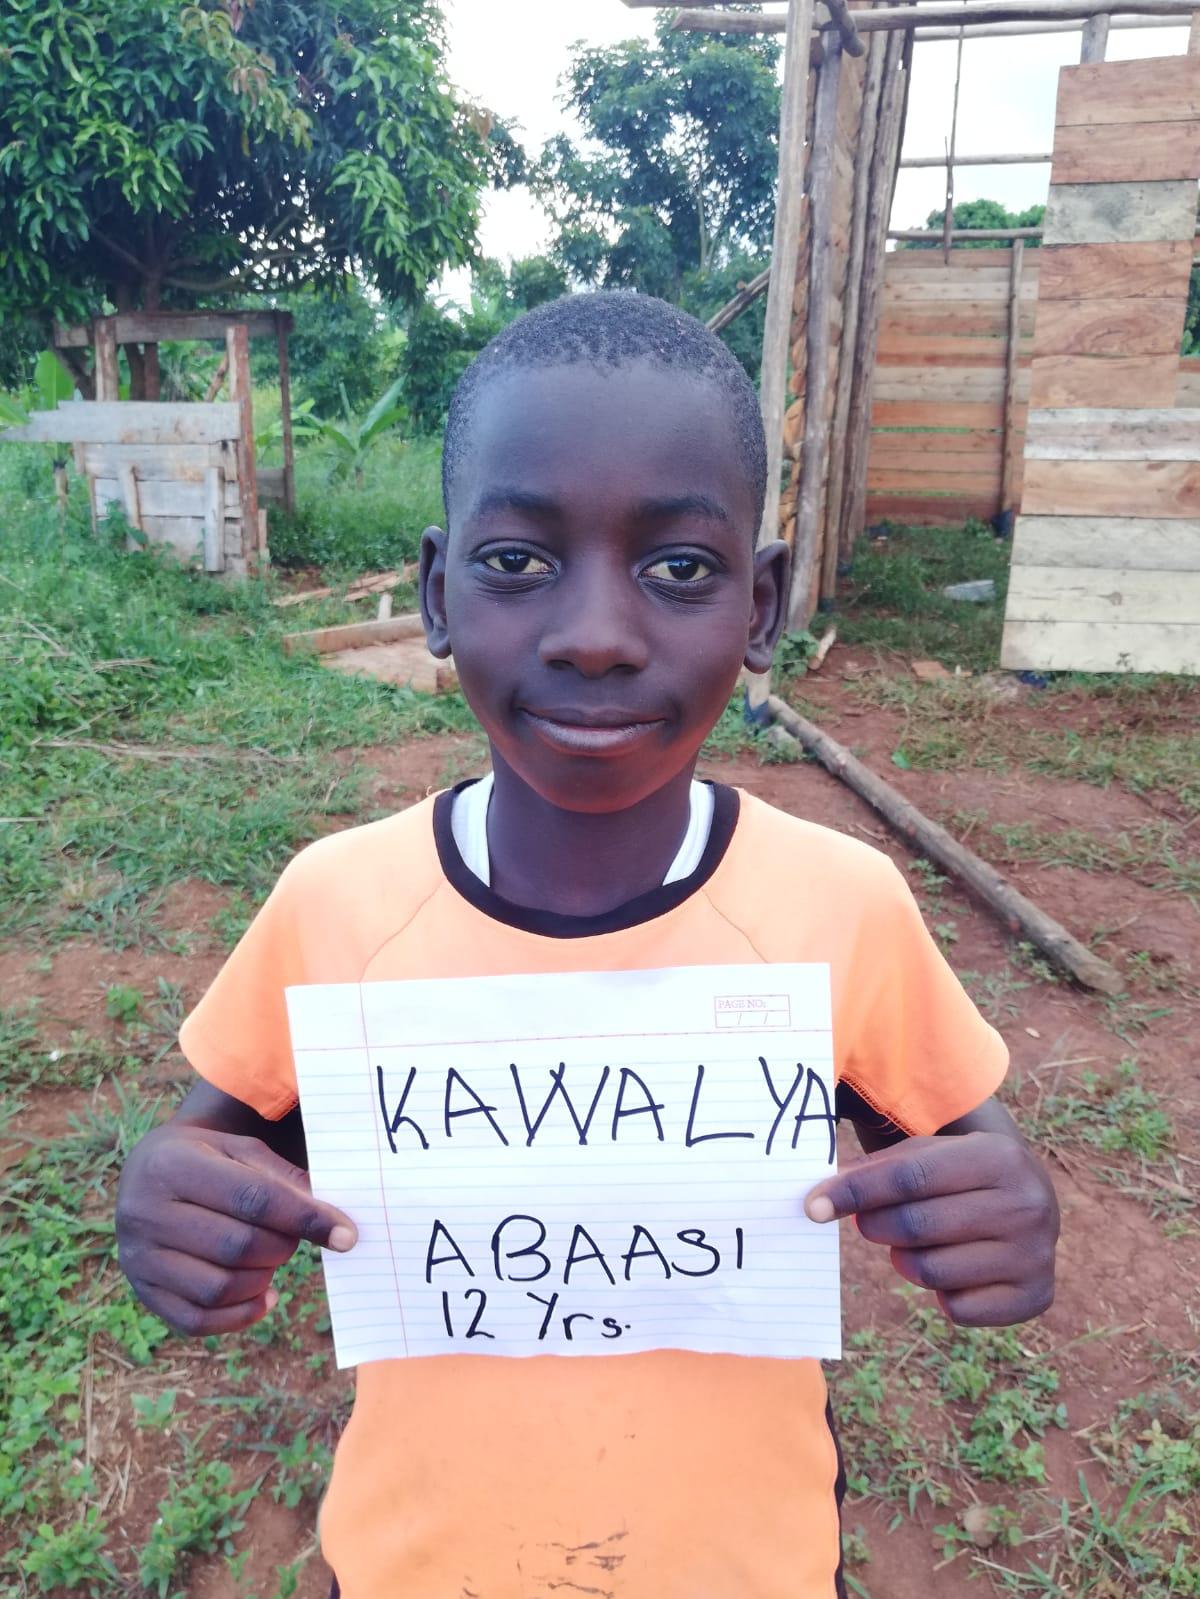 Kawalya, Abassi